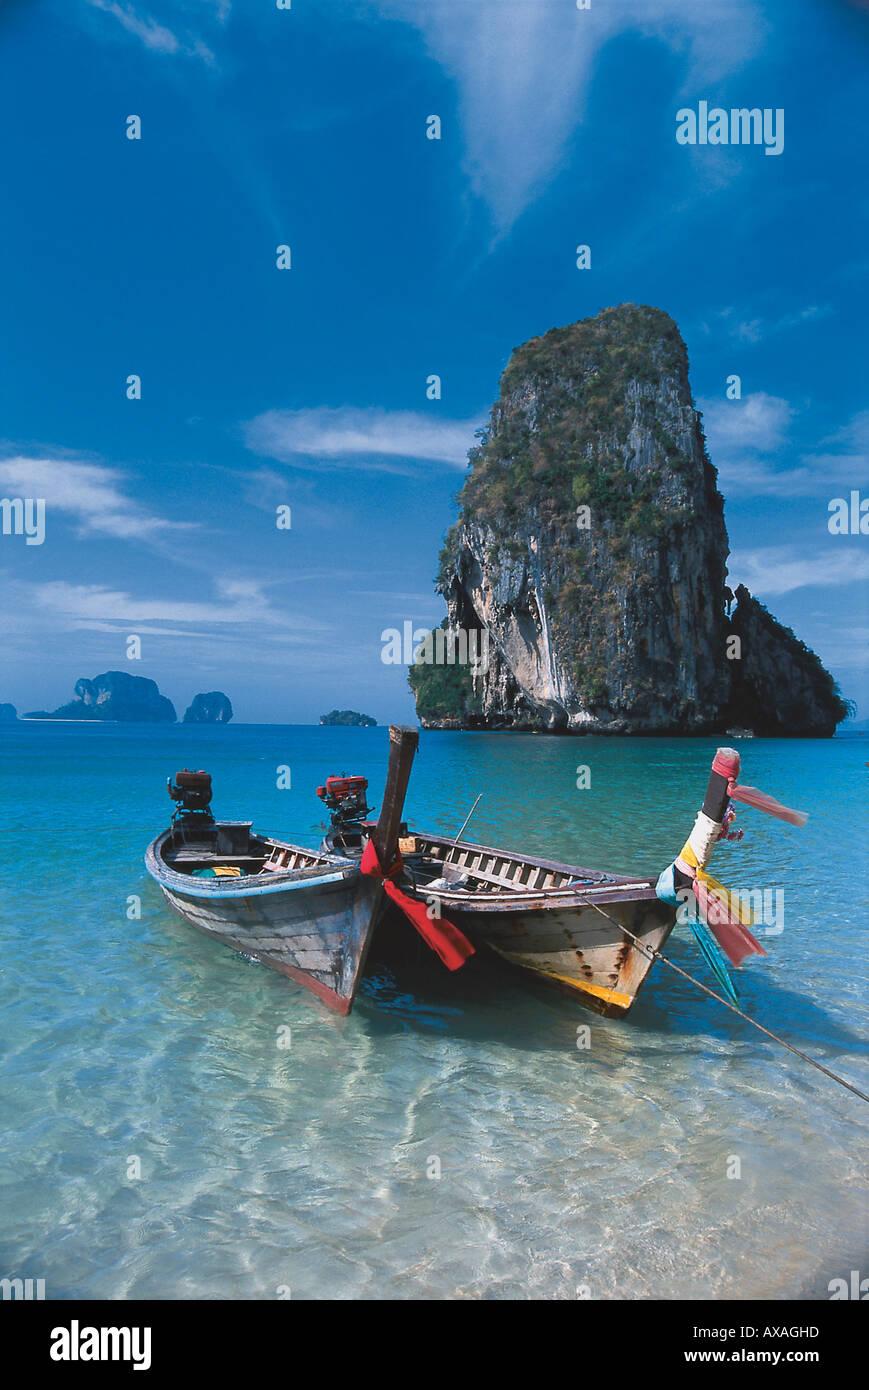 Boote am Hat Tham Phra Nang Strand, Krabi, Andamanenkueste Thailand - Stock Image